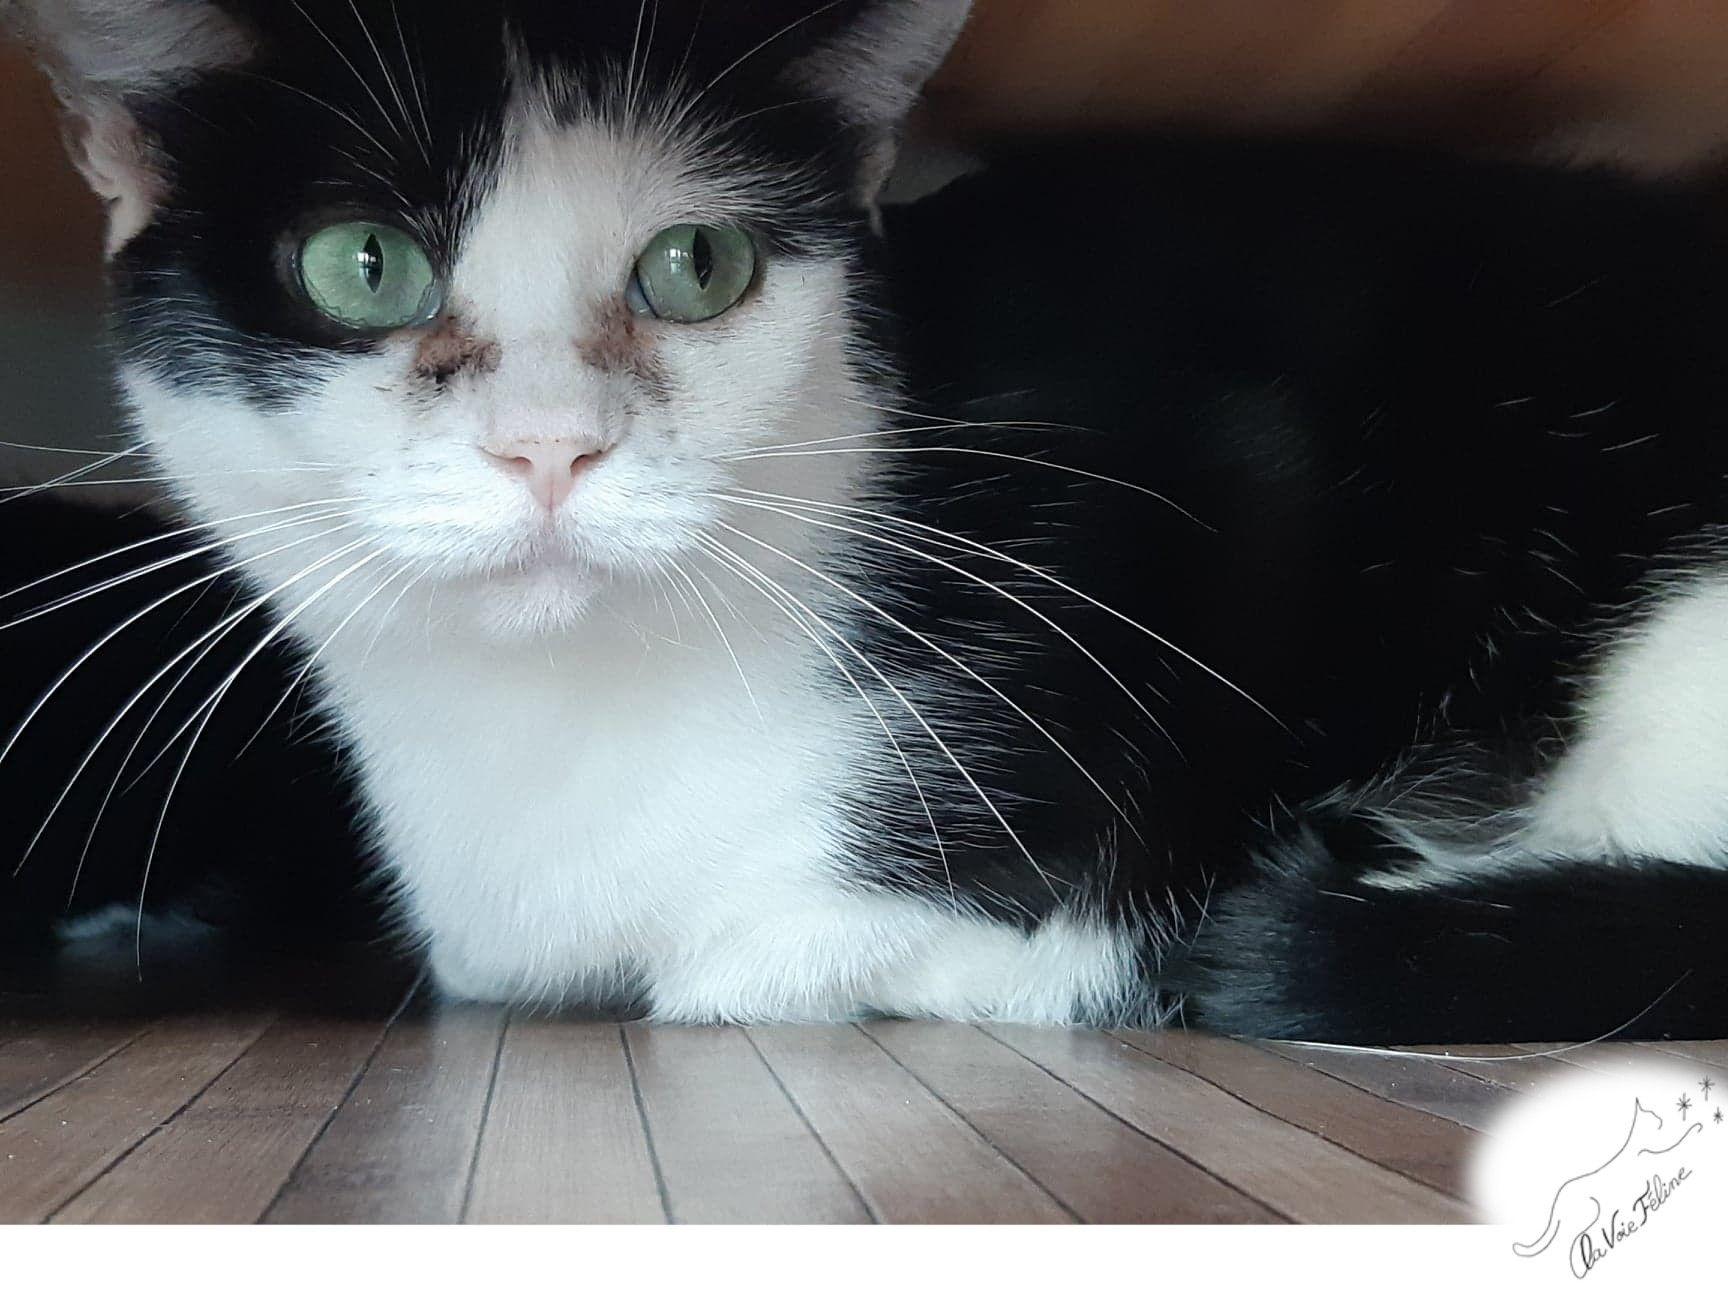 Emeraude - Adopter un chat – Ile de France